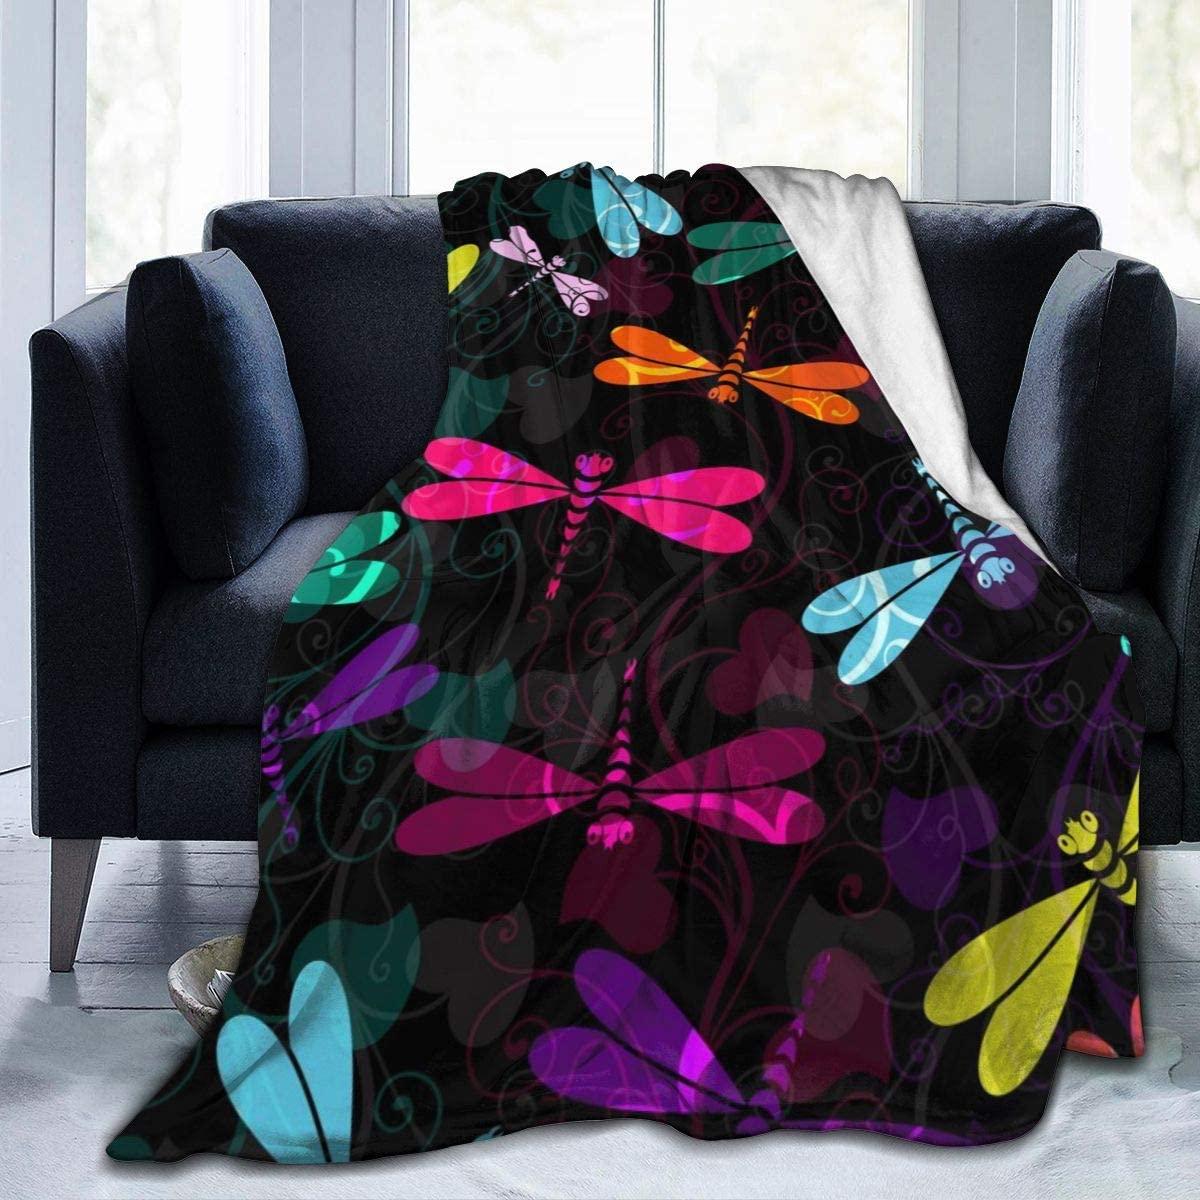 Micro Fleece Plush Soft Baby Blanket Damask Flower Dragonfly Animal Red Blue Green Black Fluffy Warm Toddler Bed/Crib Blanket Lightweight Flannel Daycare Nap Kids Sleeping Tummy Time Throw Blanket Gir